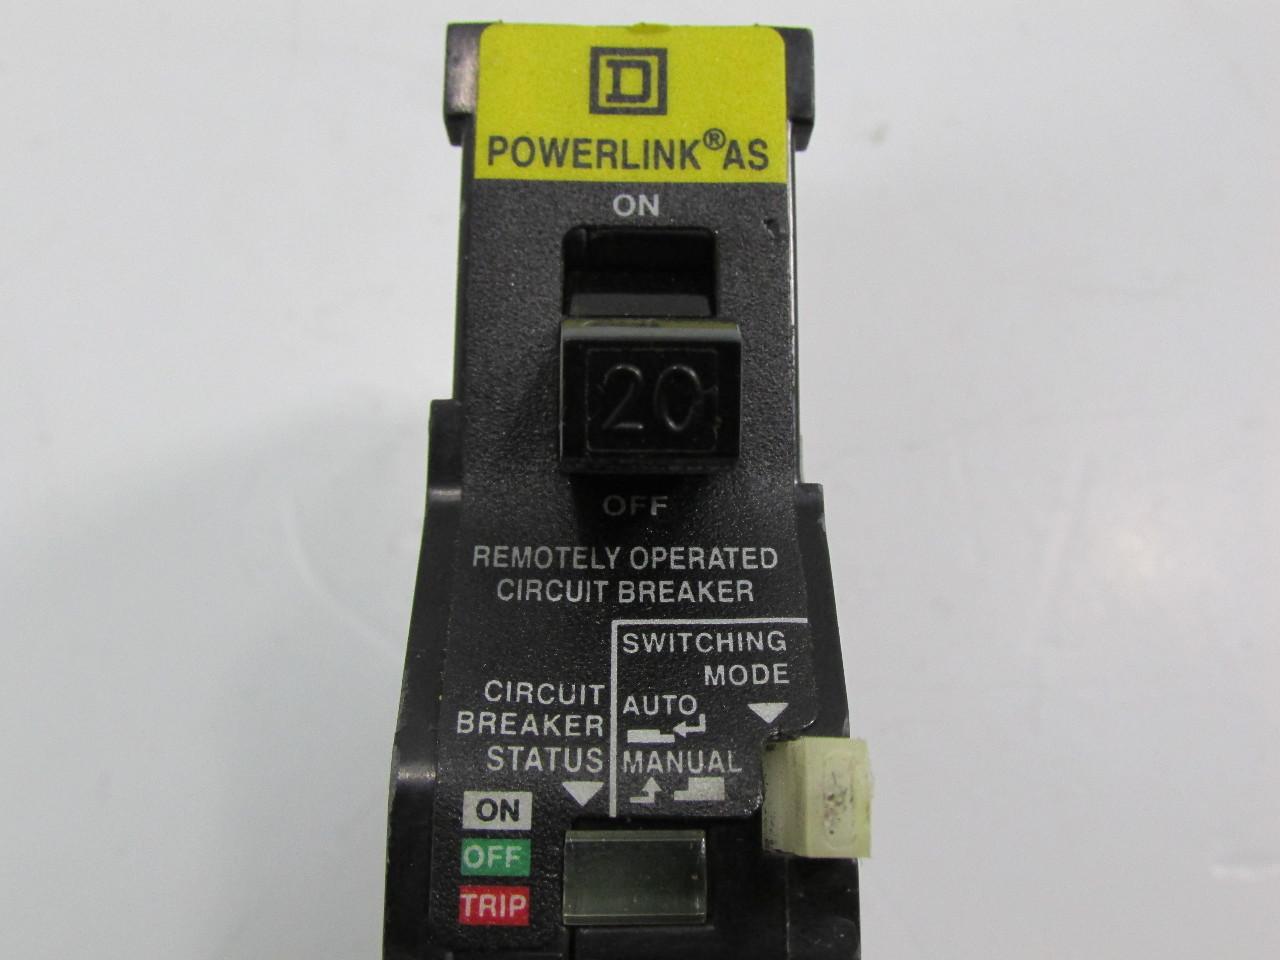 SQUARE D EHB14020AS REMOTE CONTROL CIRCUIT BREAKER EHB AS POWERLINK AS  #ABAC1F